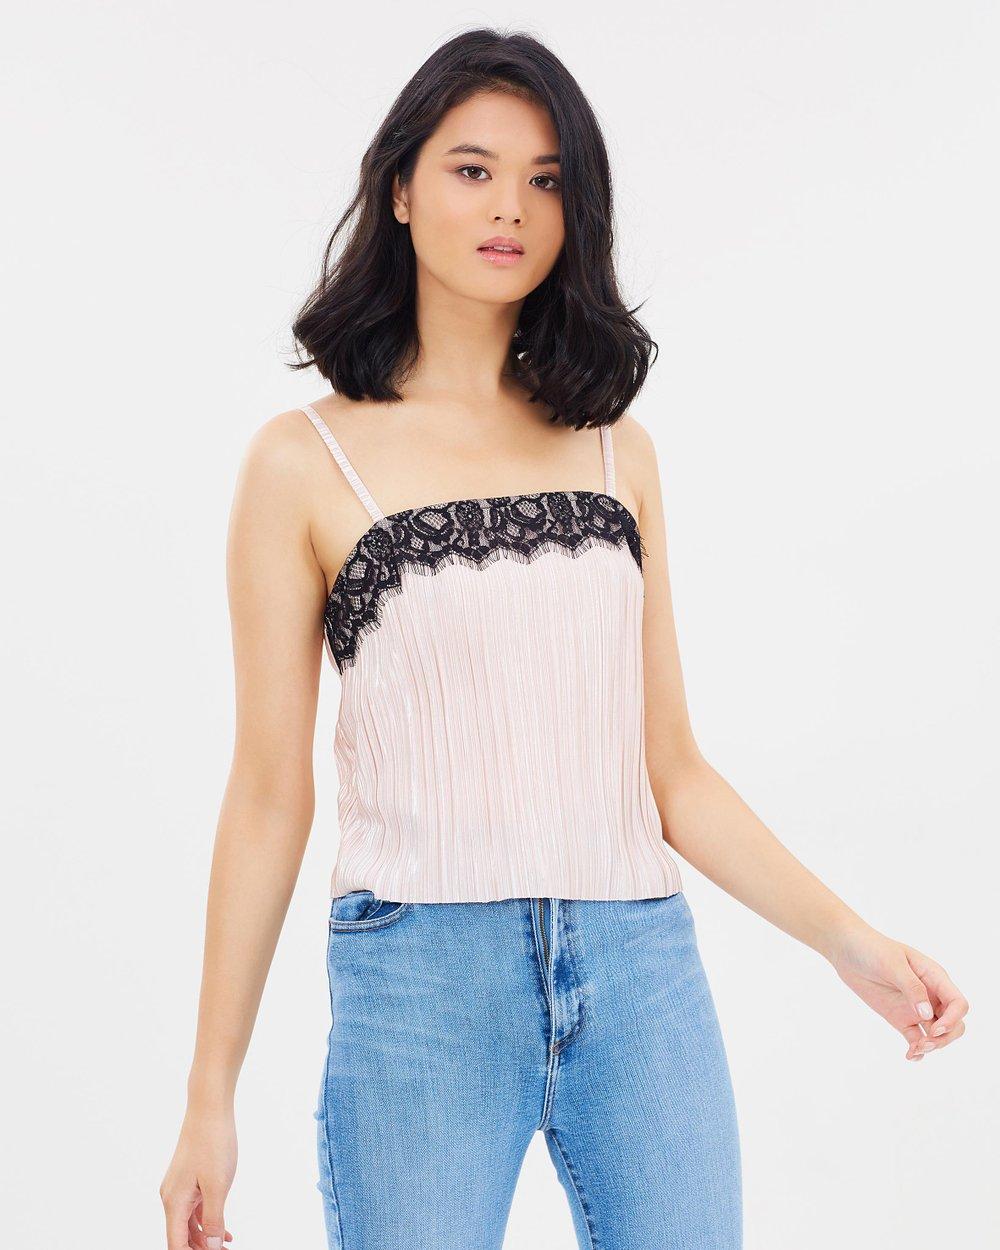 6639f927a4 Lace Trim Cami Top by Miss Selfridge Online